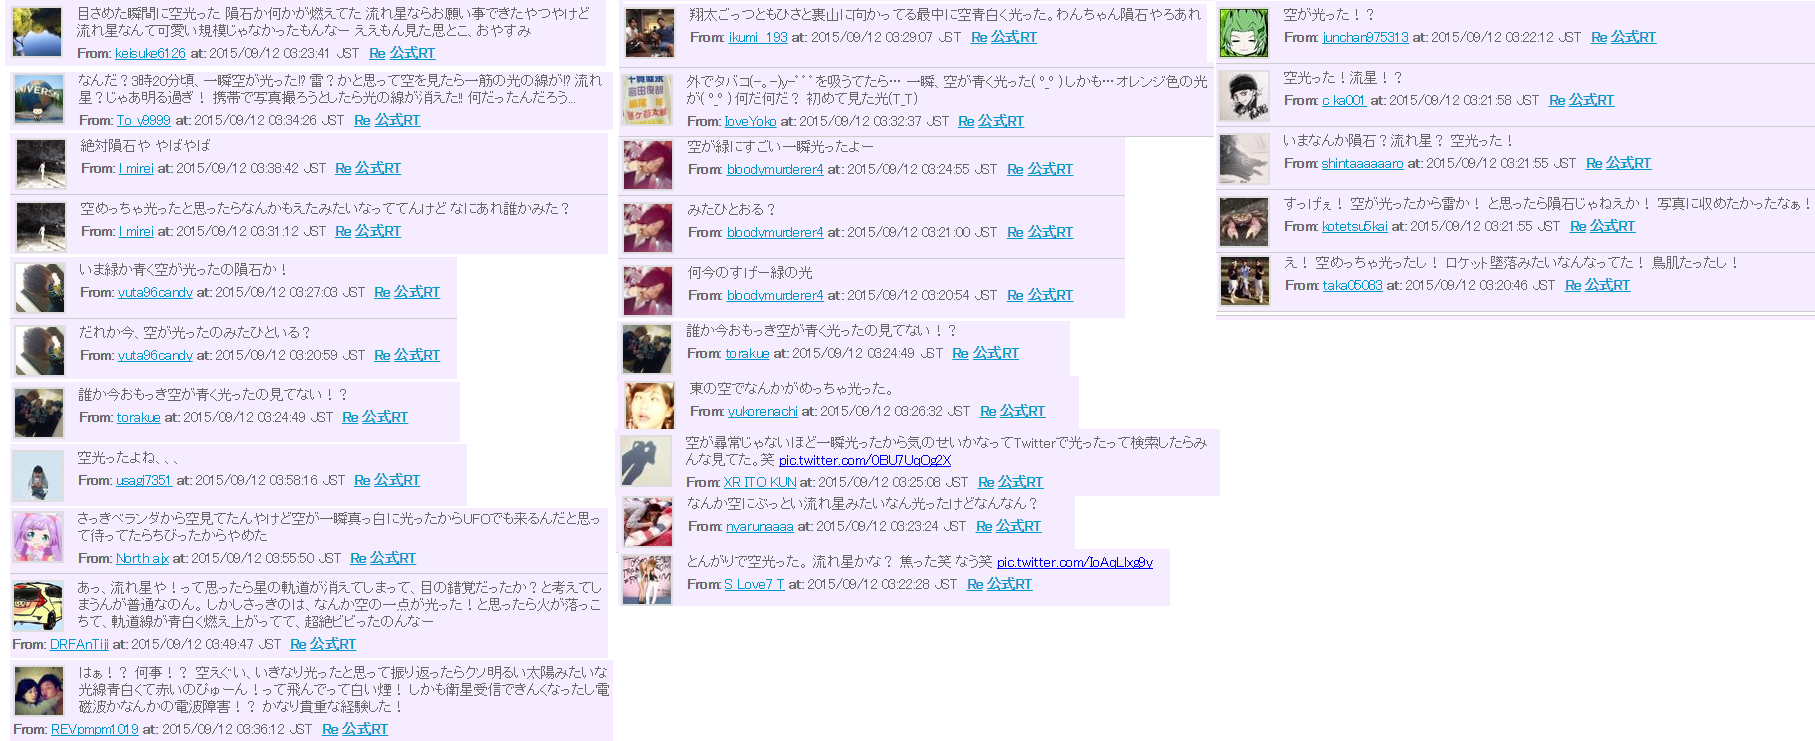 http://blog-imgs-81.fc2.com/o/k/a/okarutojishinyogen/news4vip_1442005762_5901.png